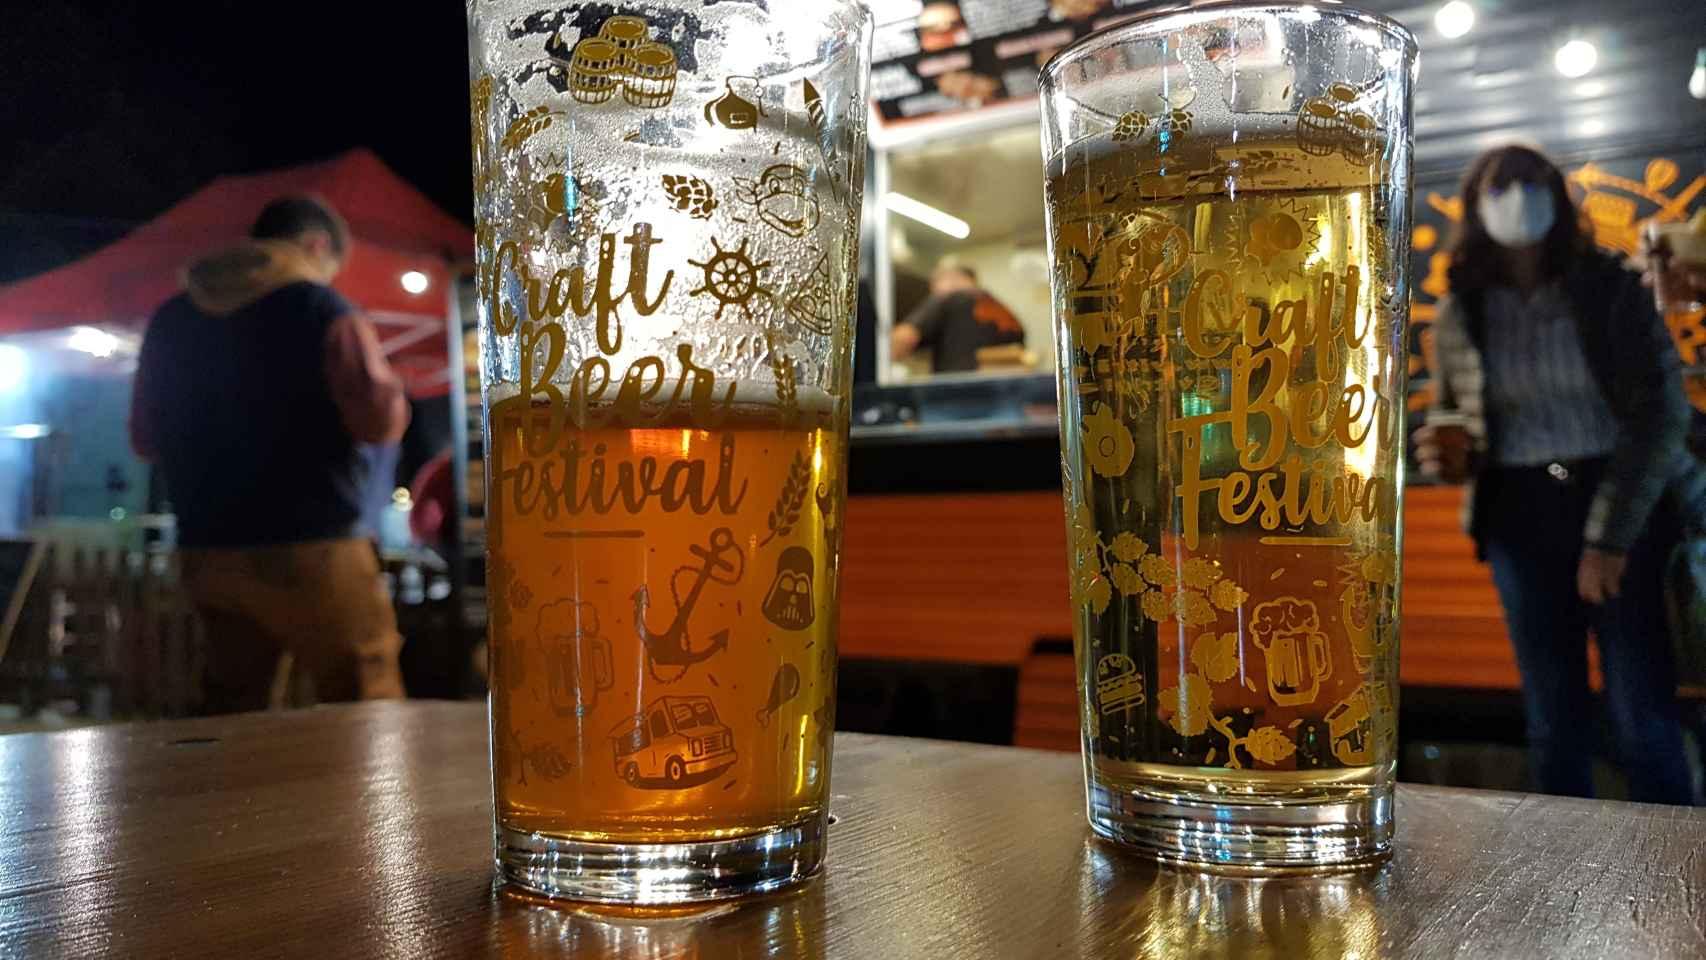 Festival de la cerveza artesana en Zamora (4).jpg